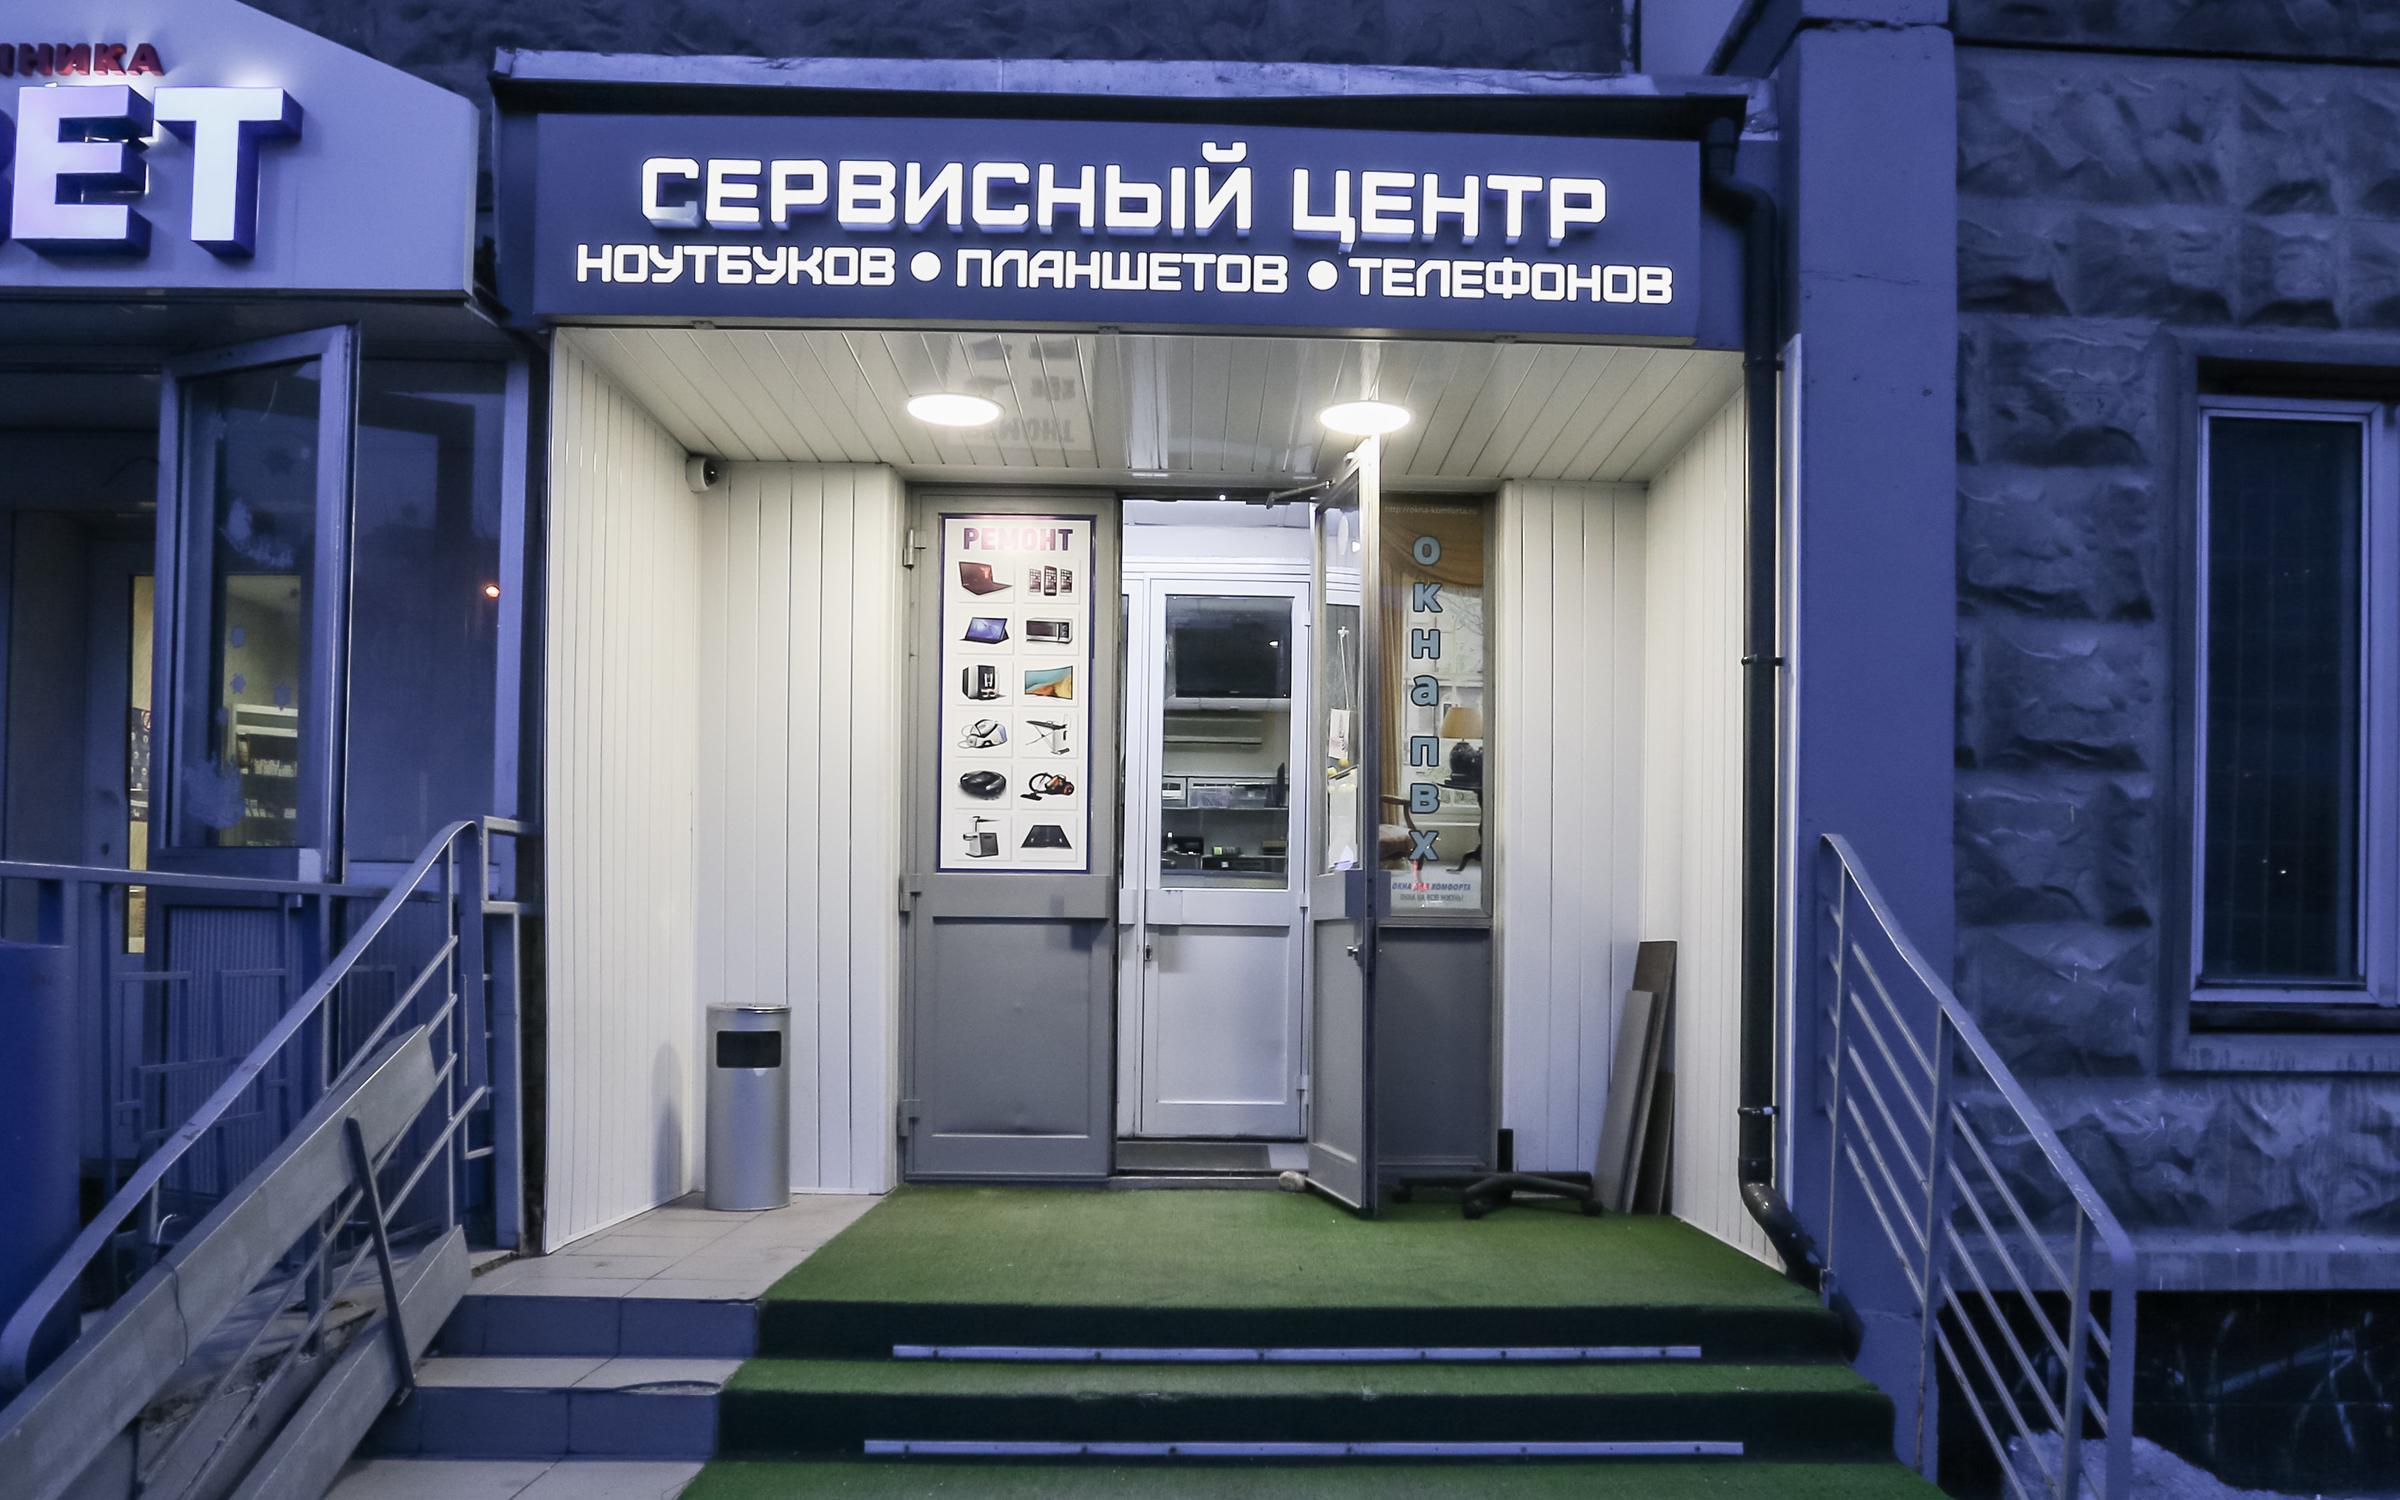 фотография Сервисного центра Restart-pro на улице Генерала Кузнецова